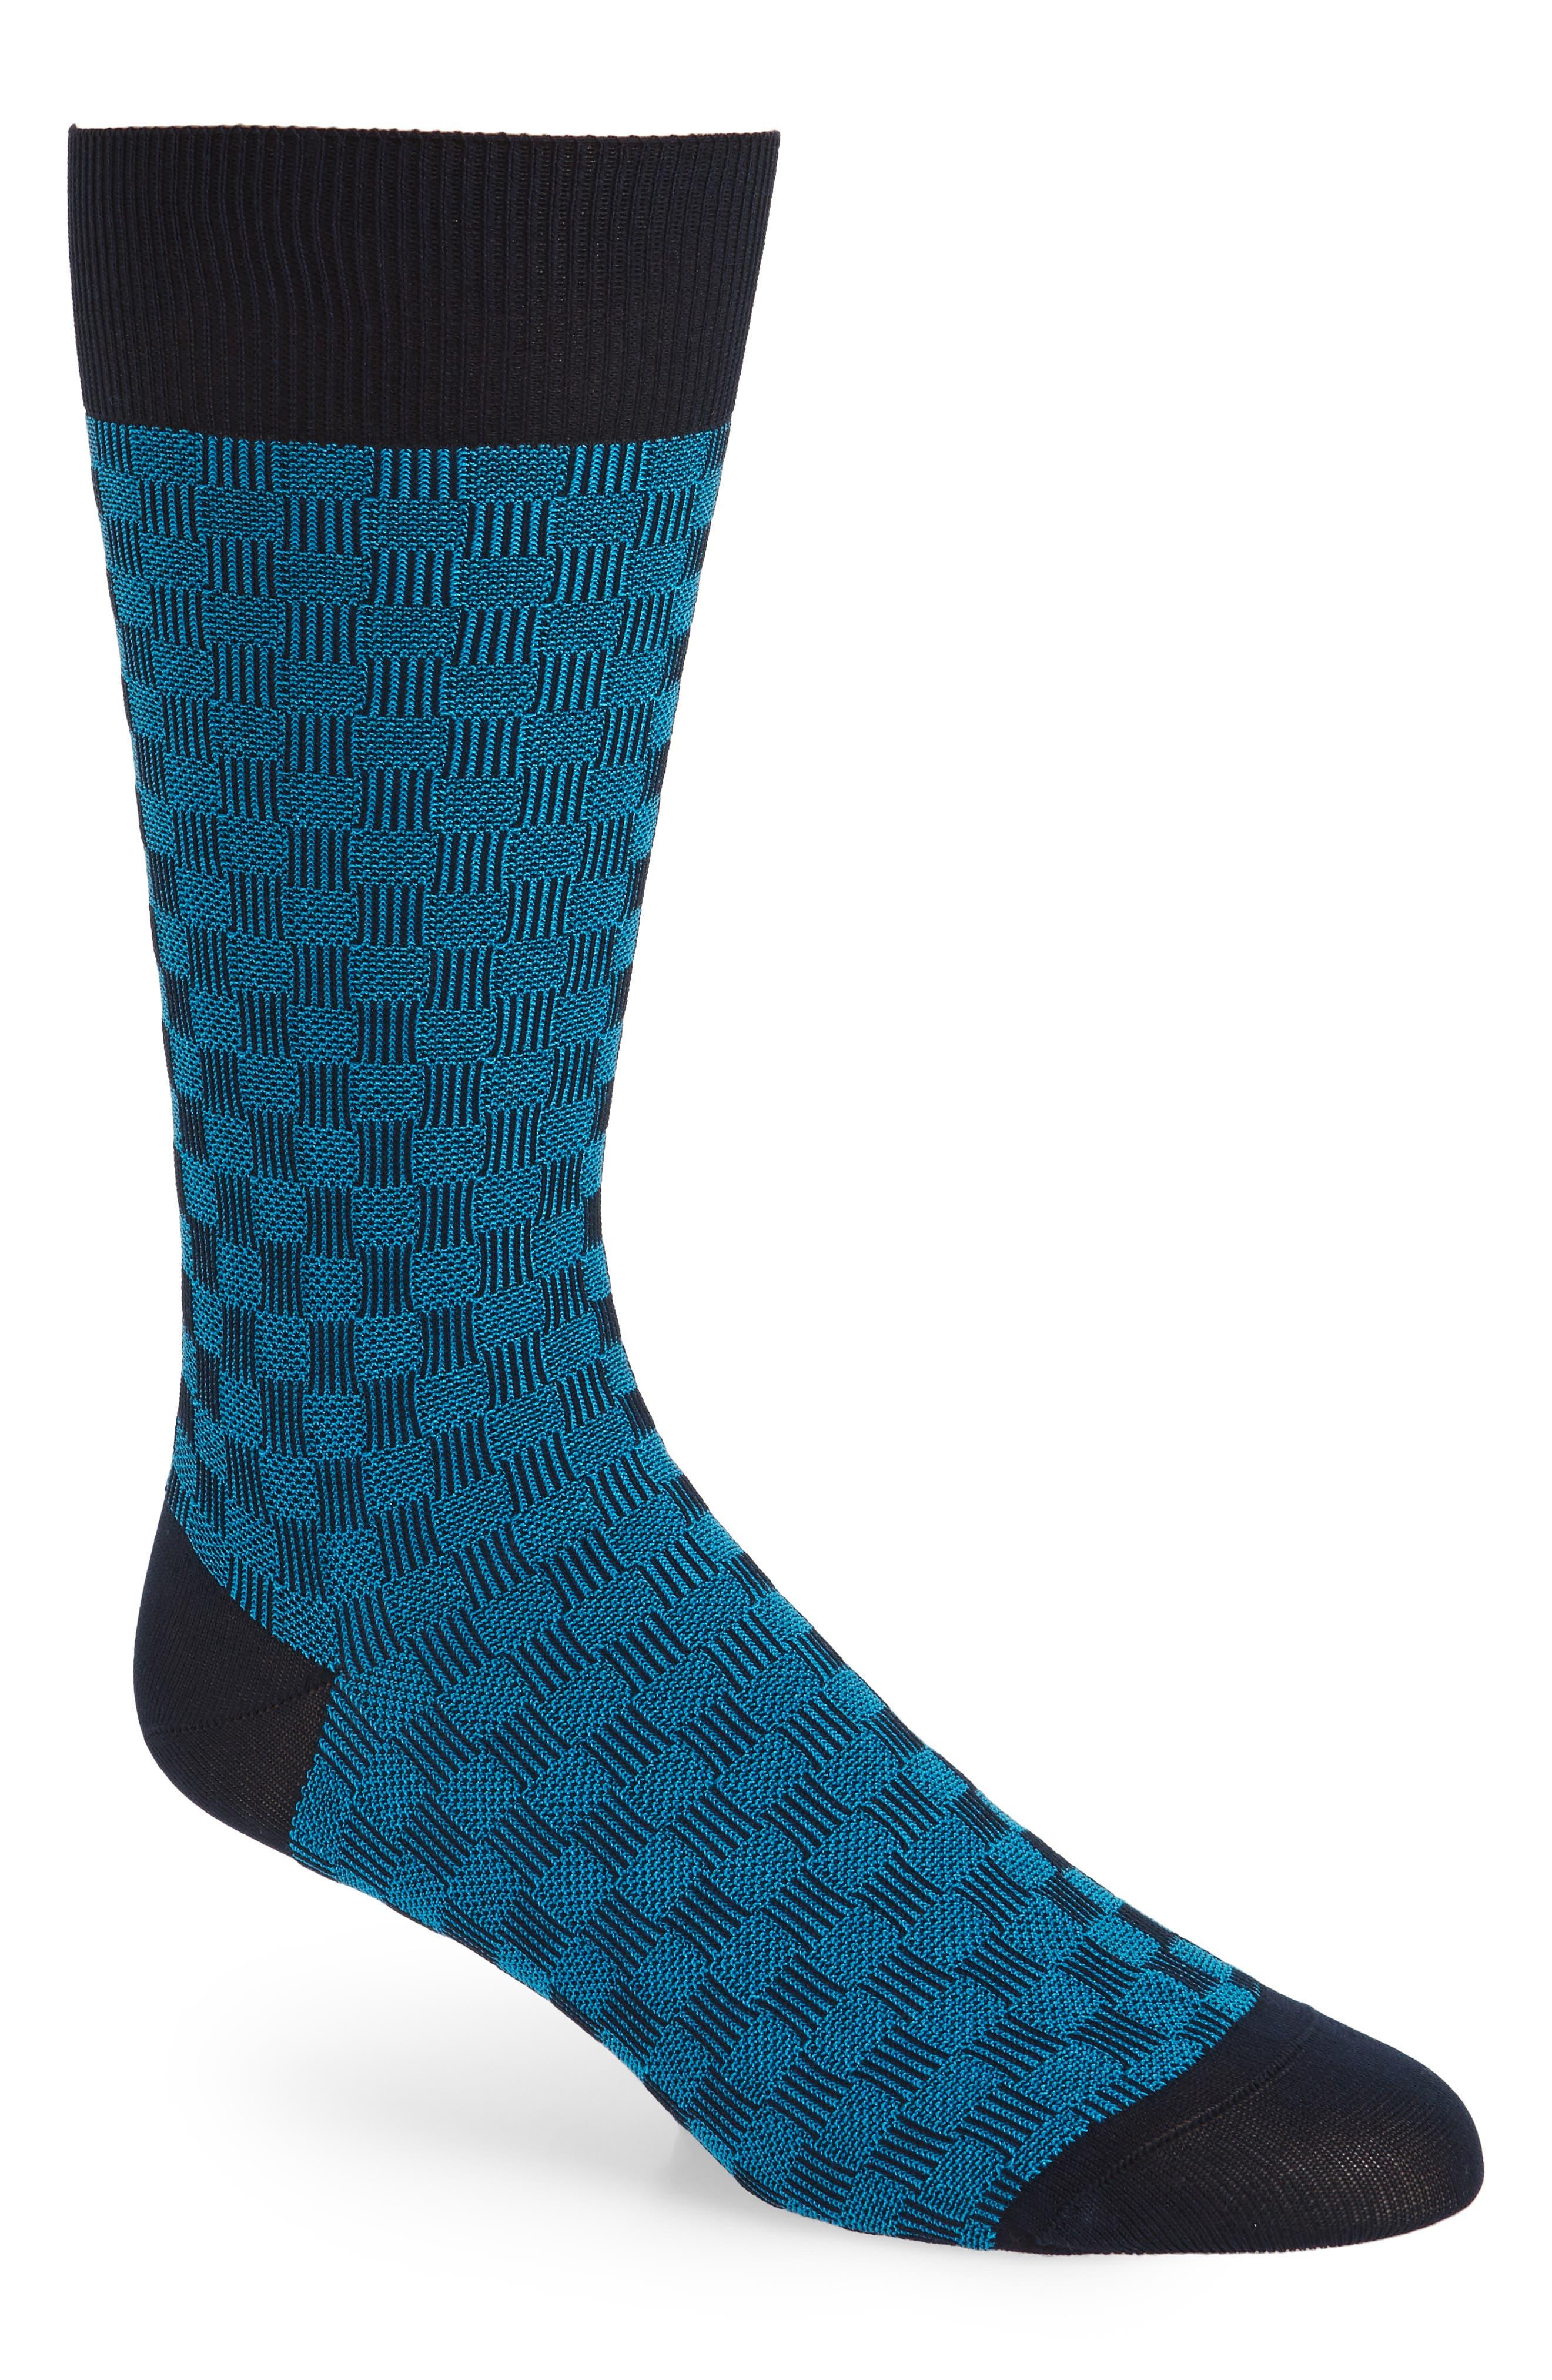 Pantherella Patchwork Socks